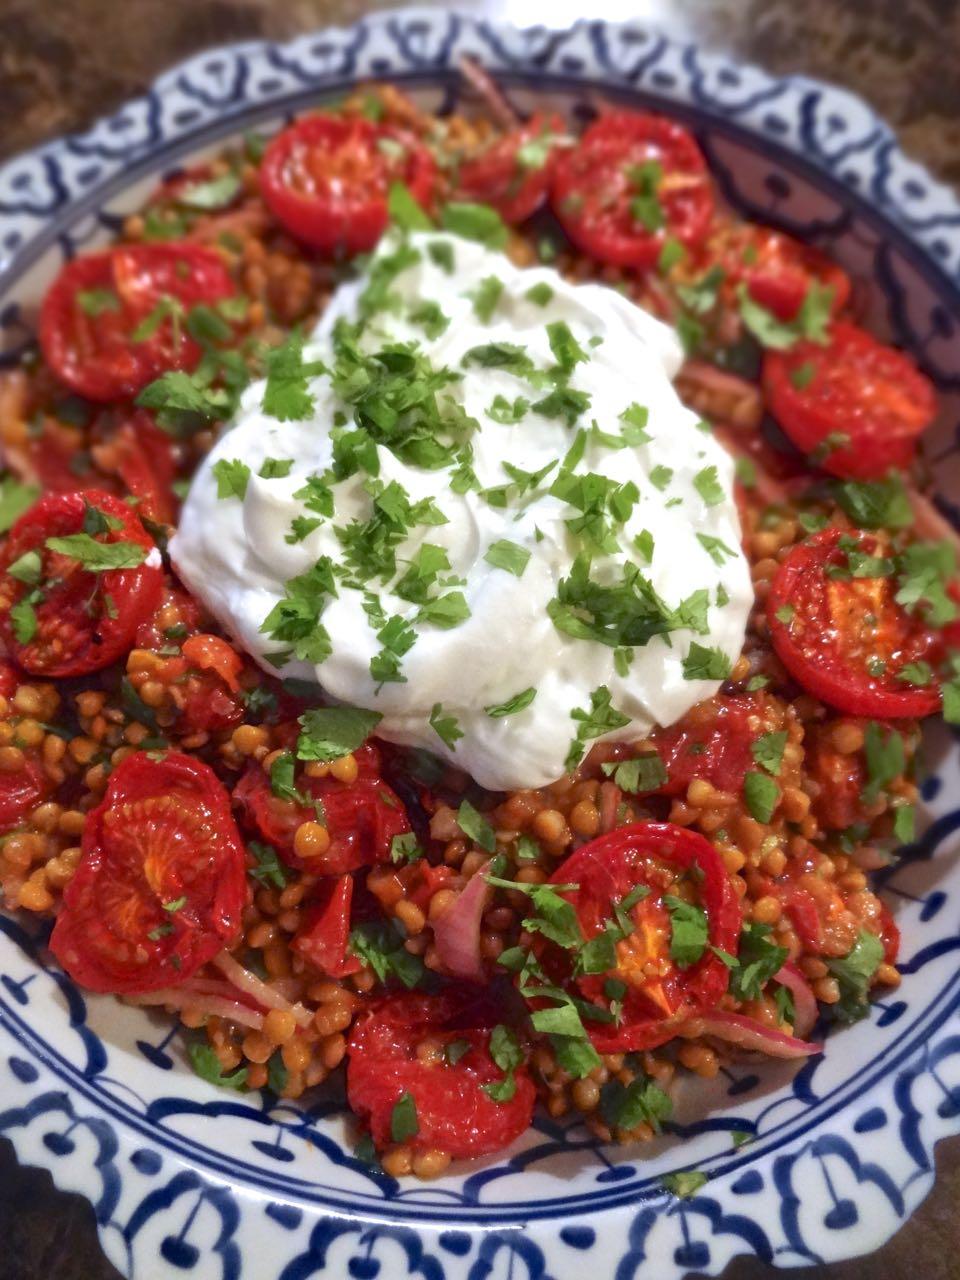 ... : Lentil Salad with Roast Tomato, Red Onion & Cilantro